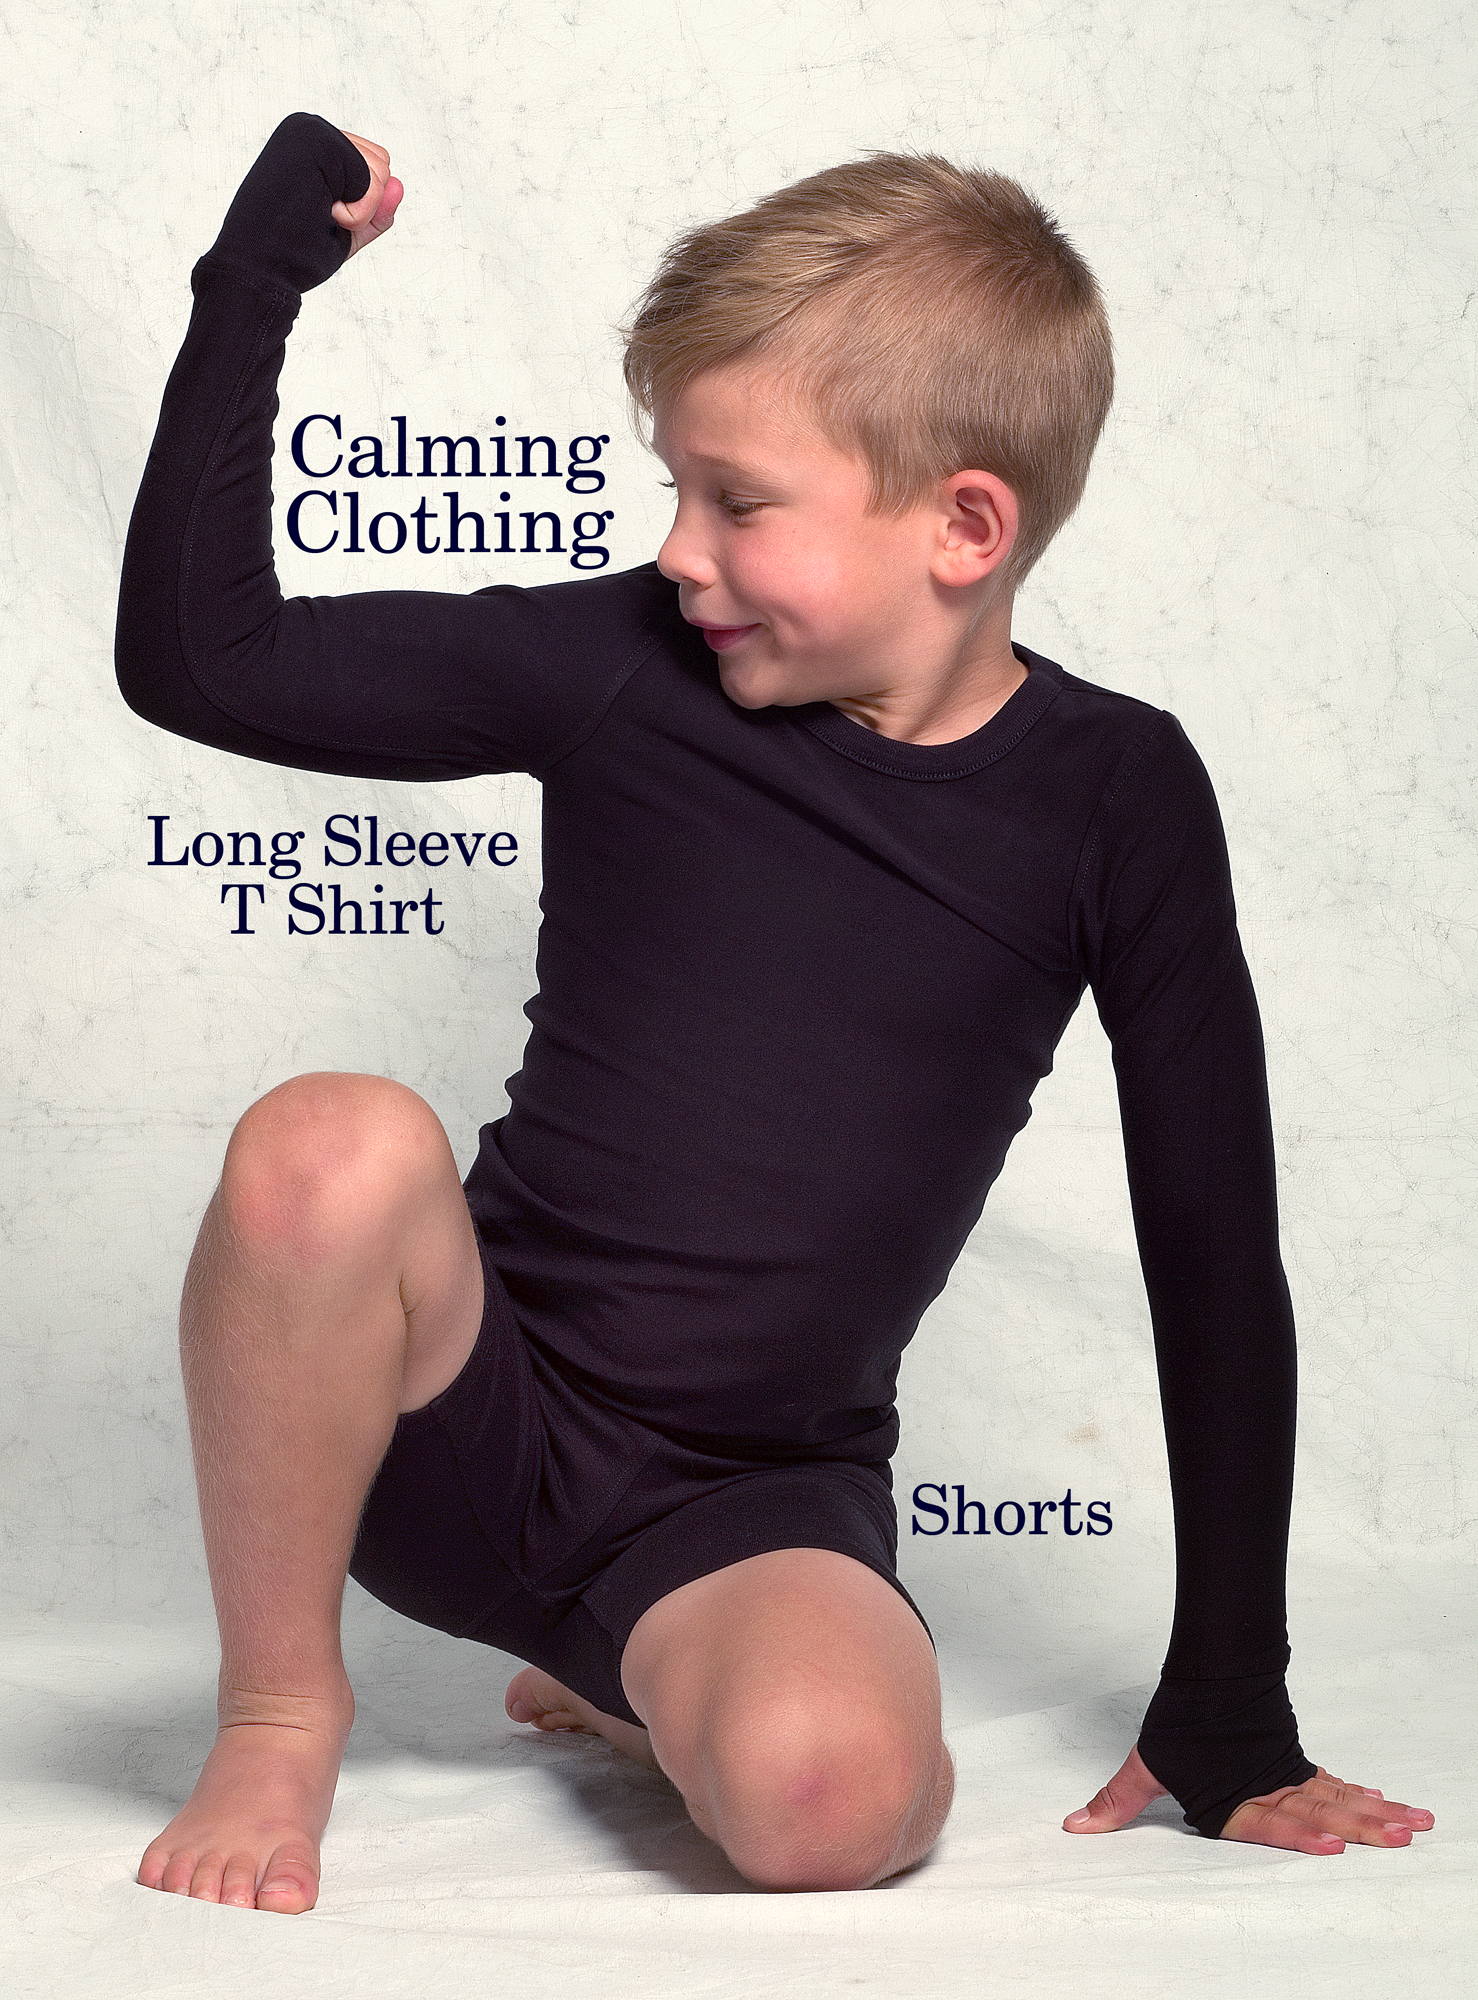 calming_clothing_long_sleeve_tshirt_black_shorts.jpg